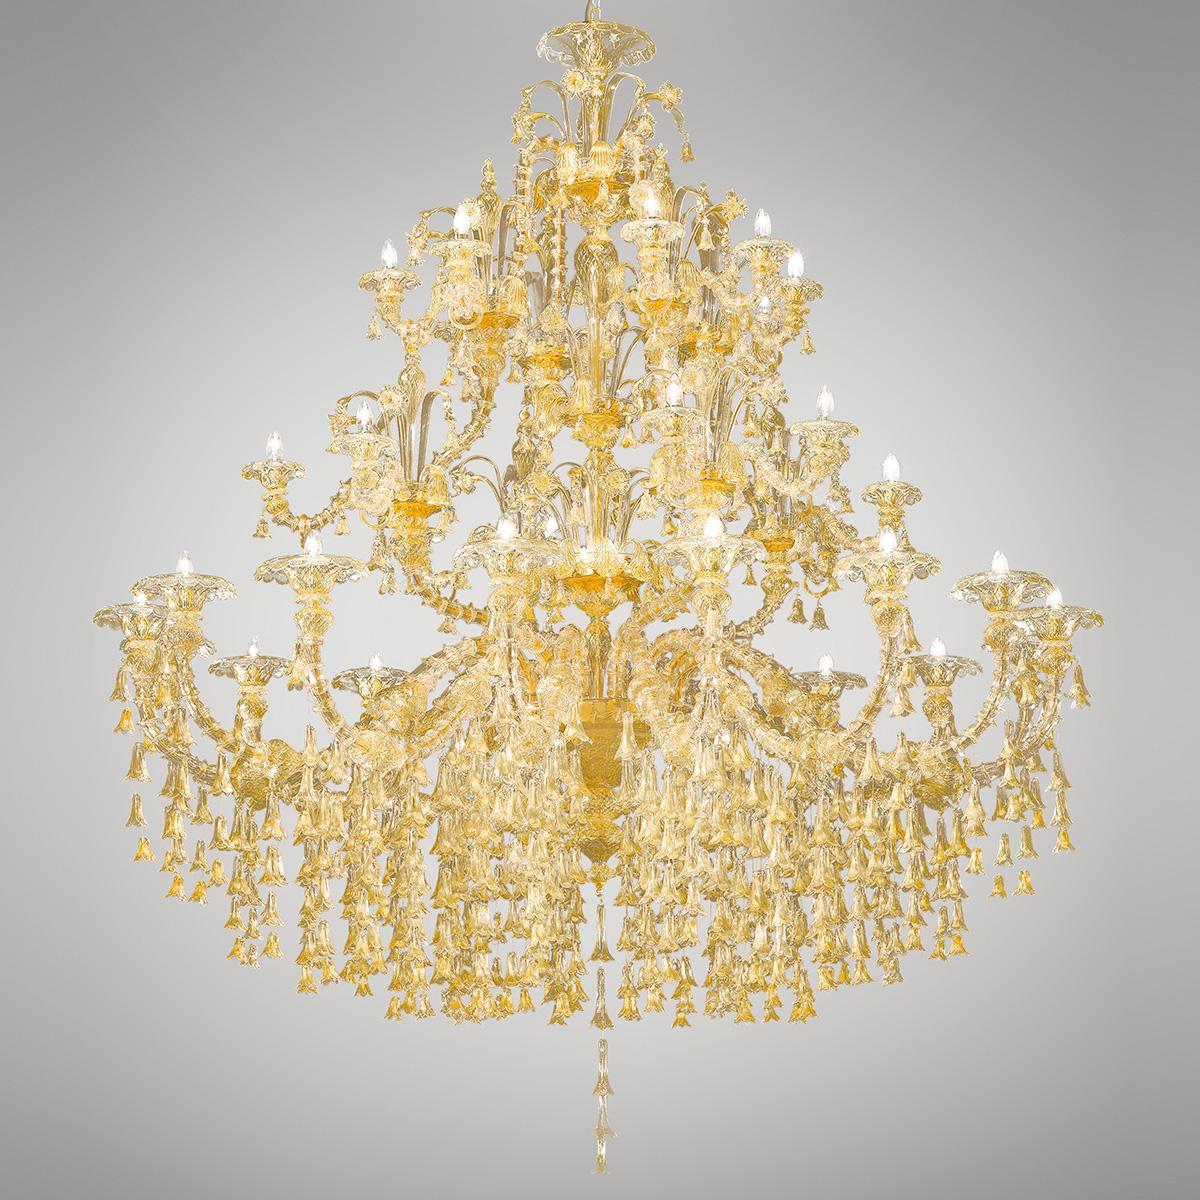 """Patrizia"" lustre en cristal de Murano - 32+8 lumières - or"